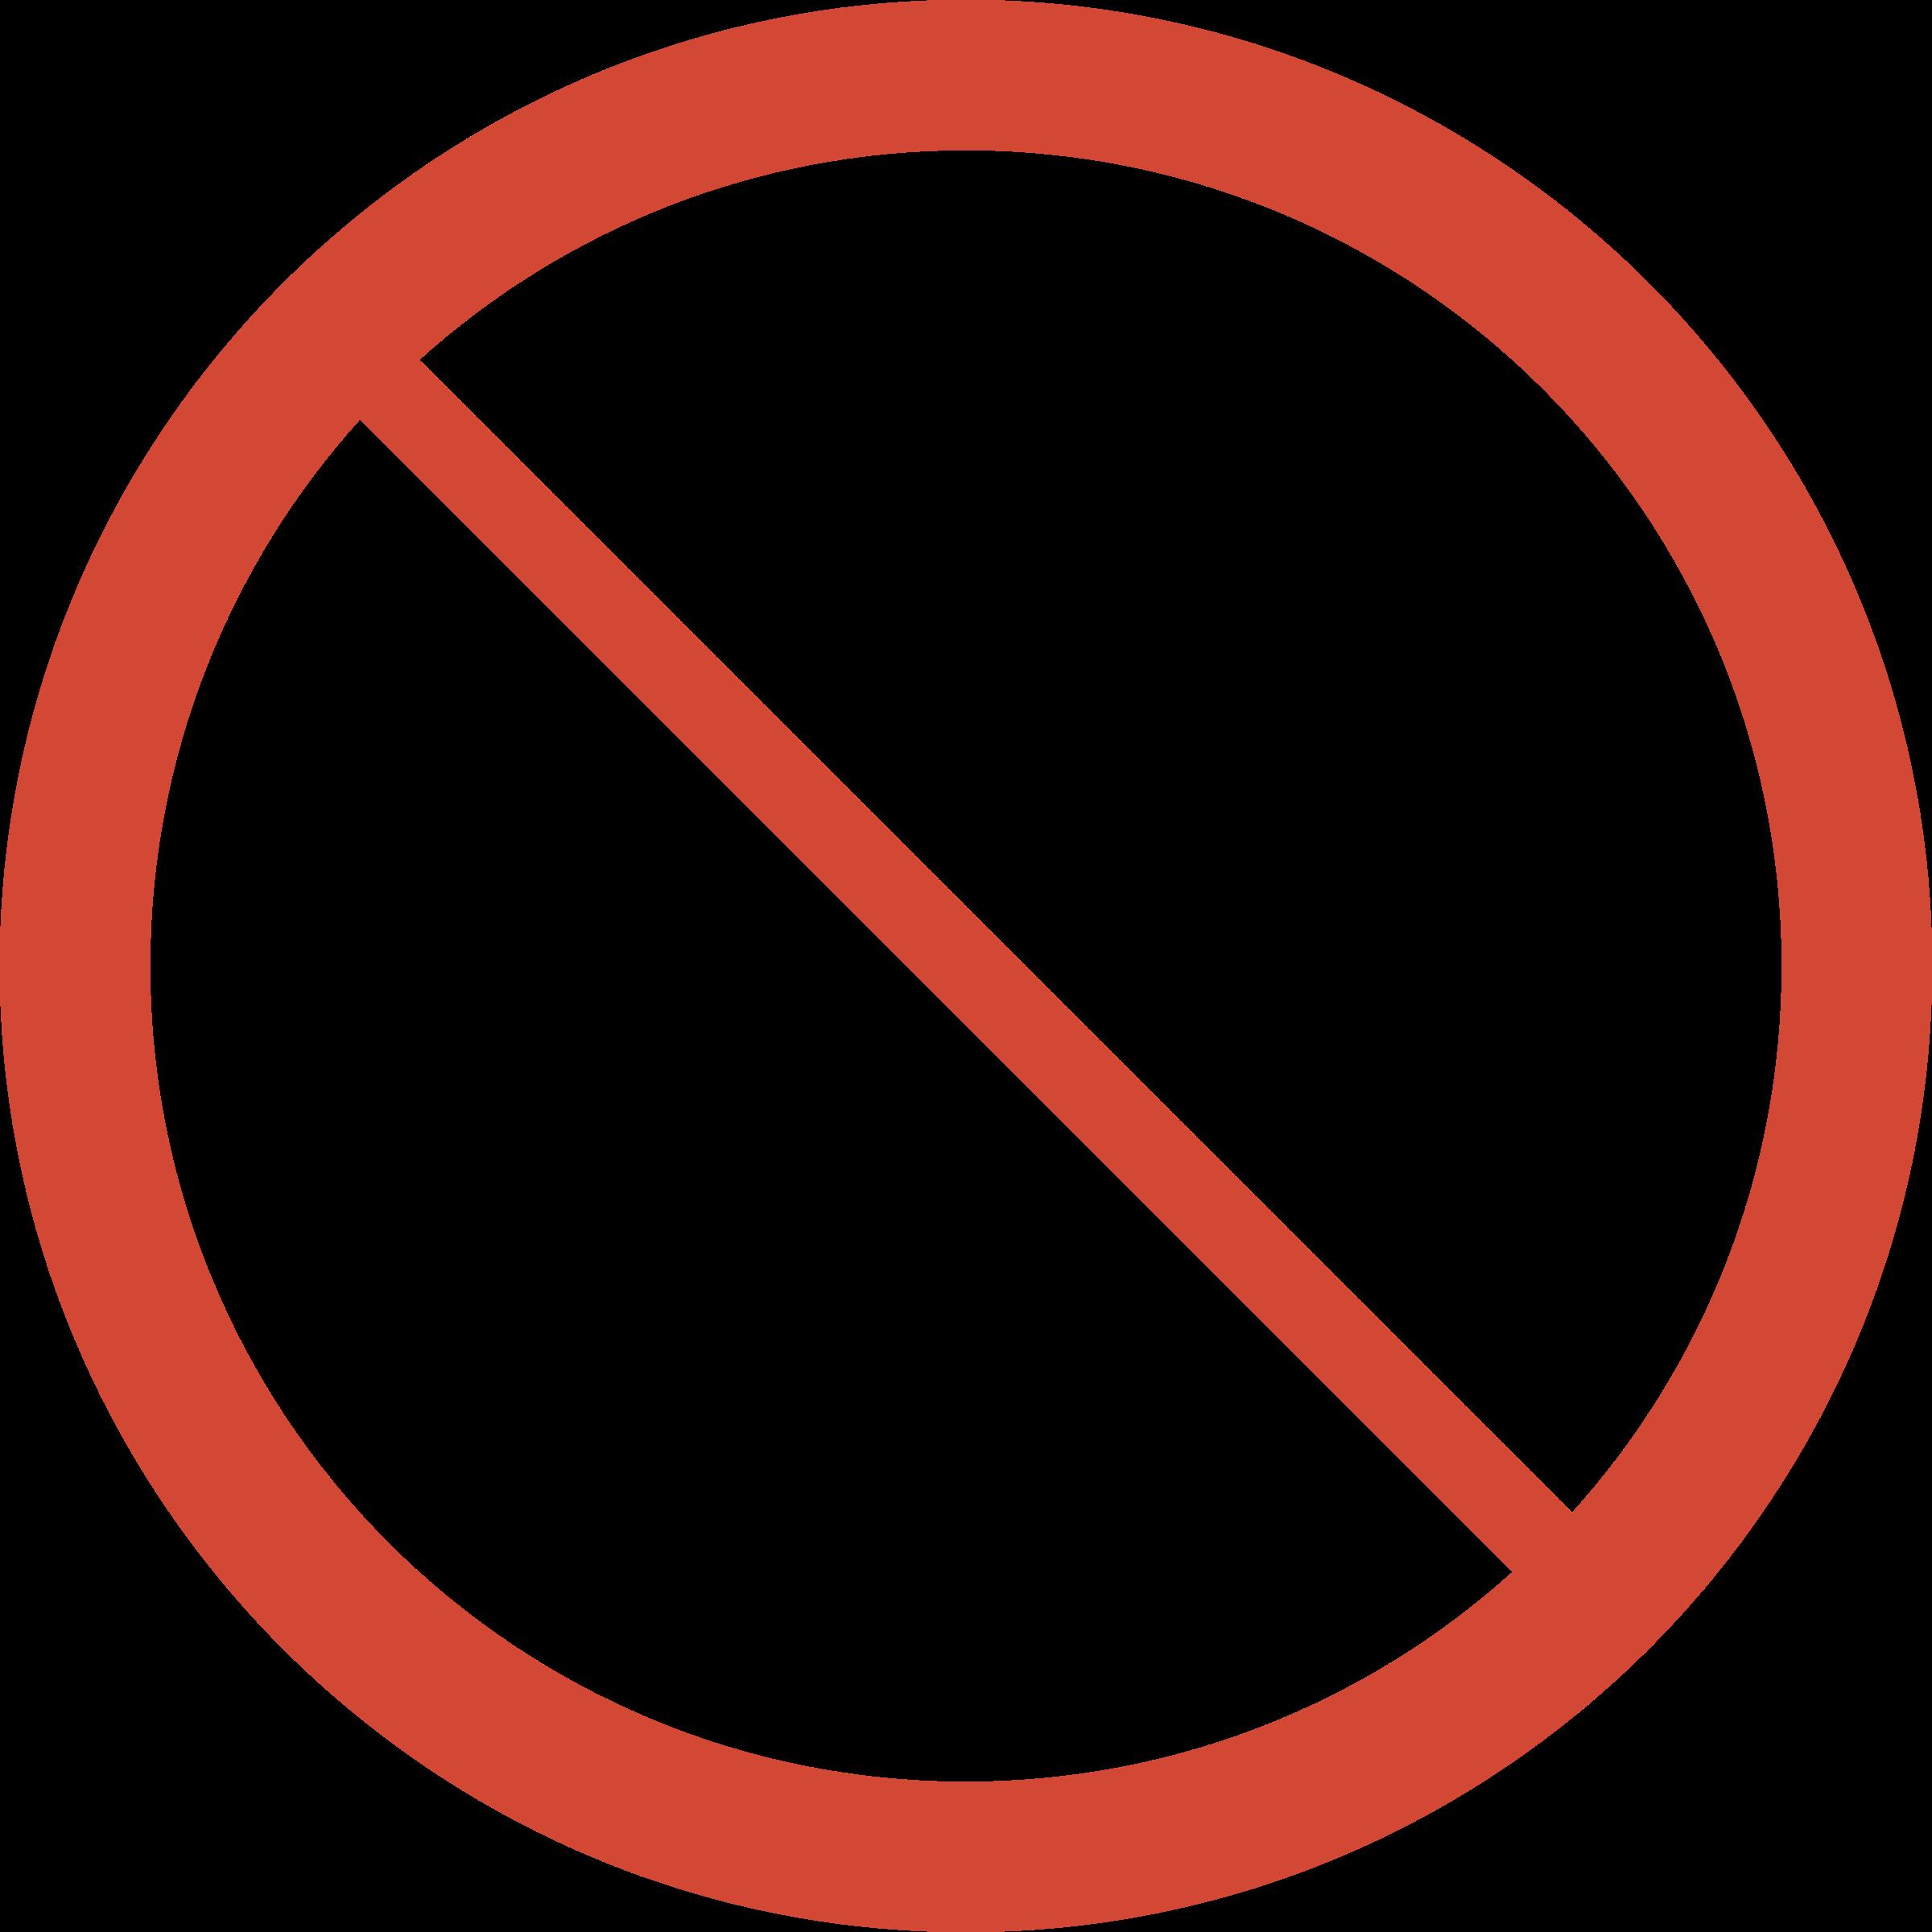 Library clipart sign Sign No Food Food No